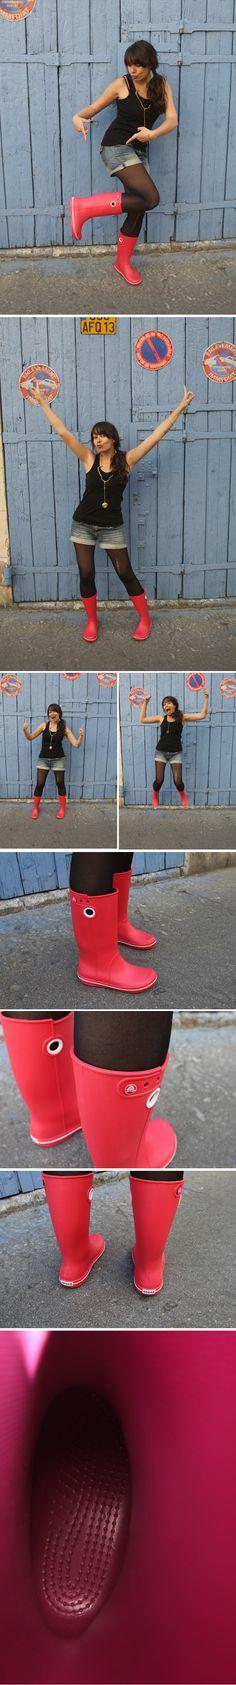 Love my crocs rain boots!